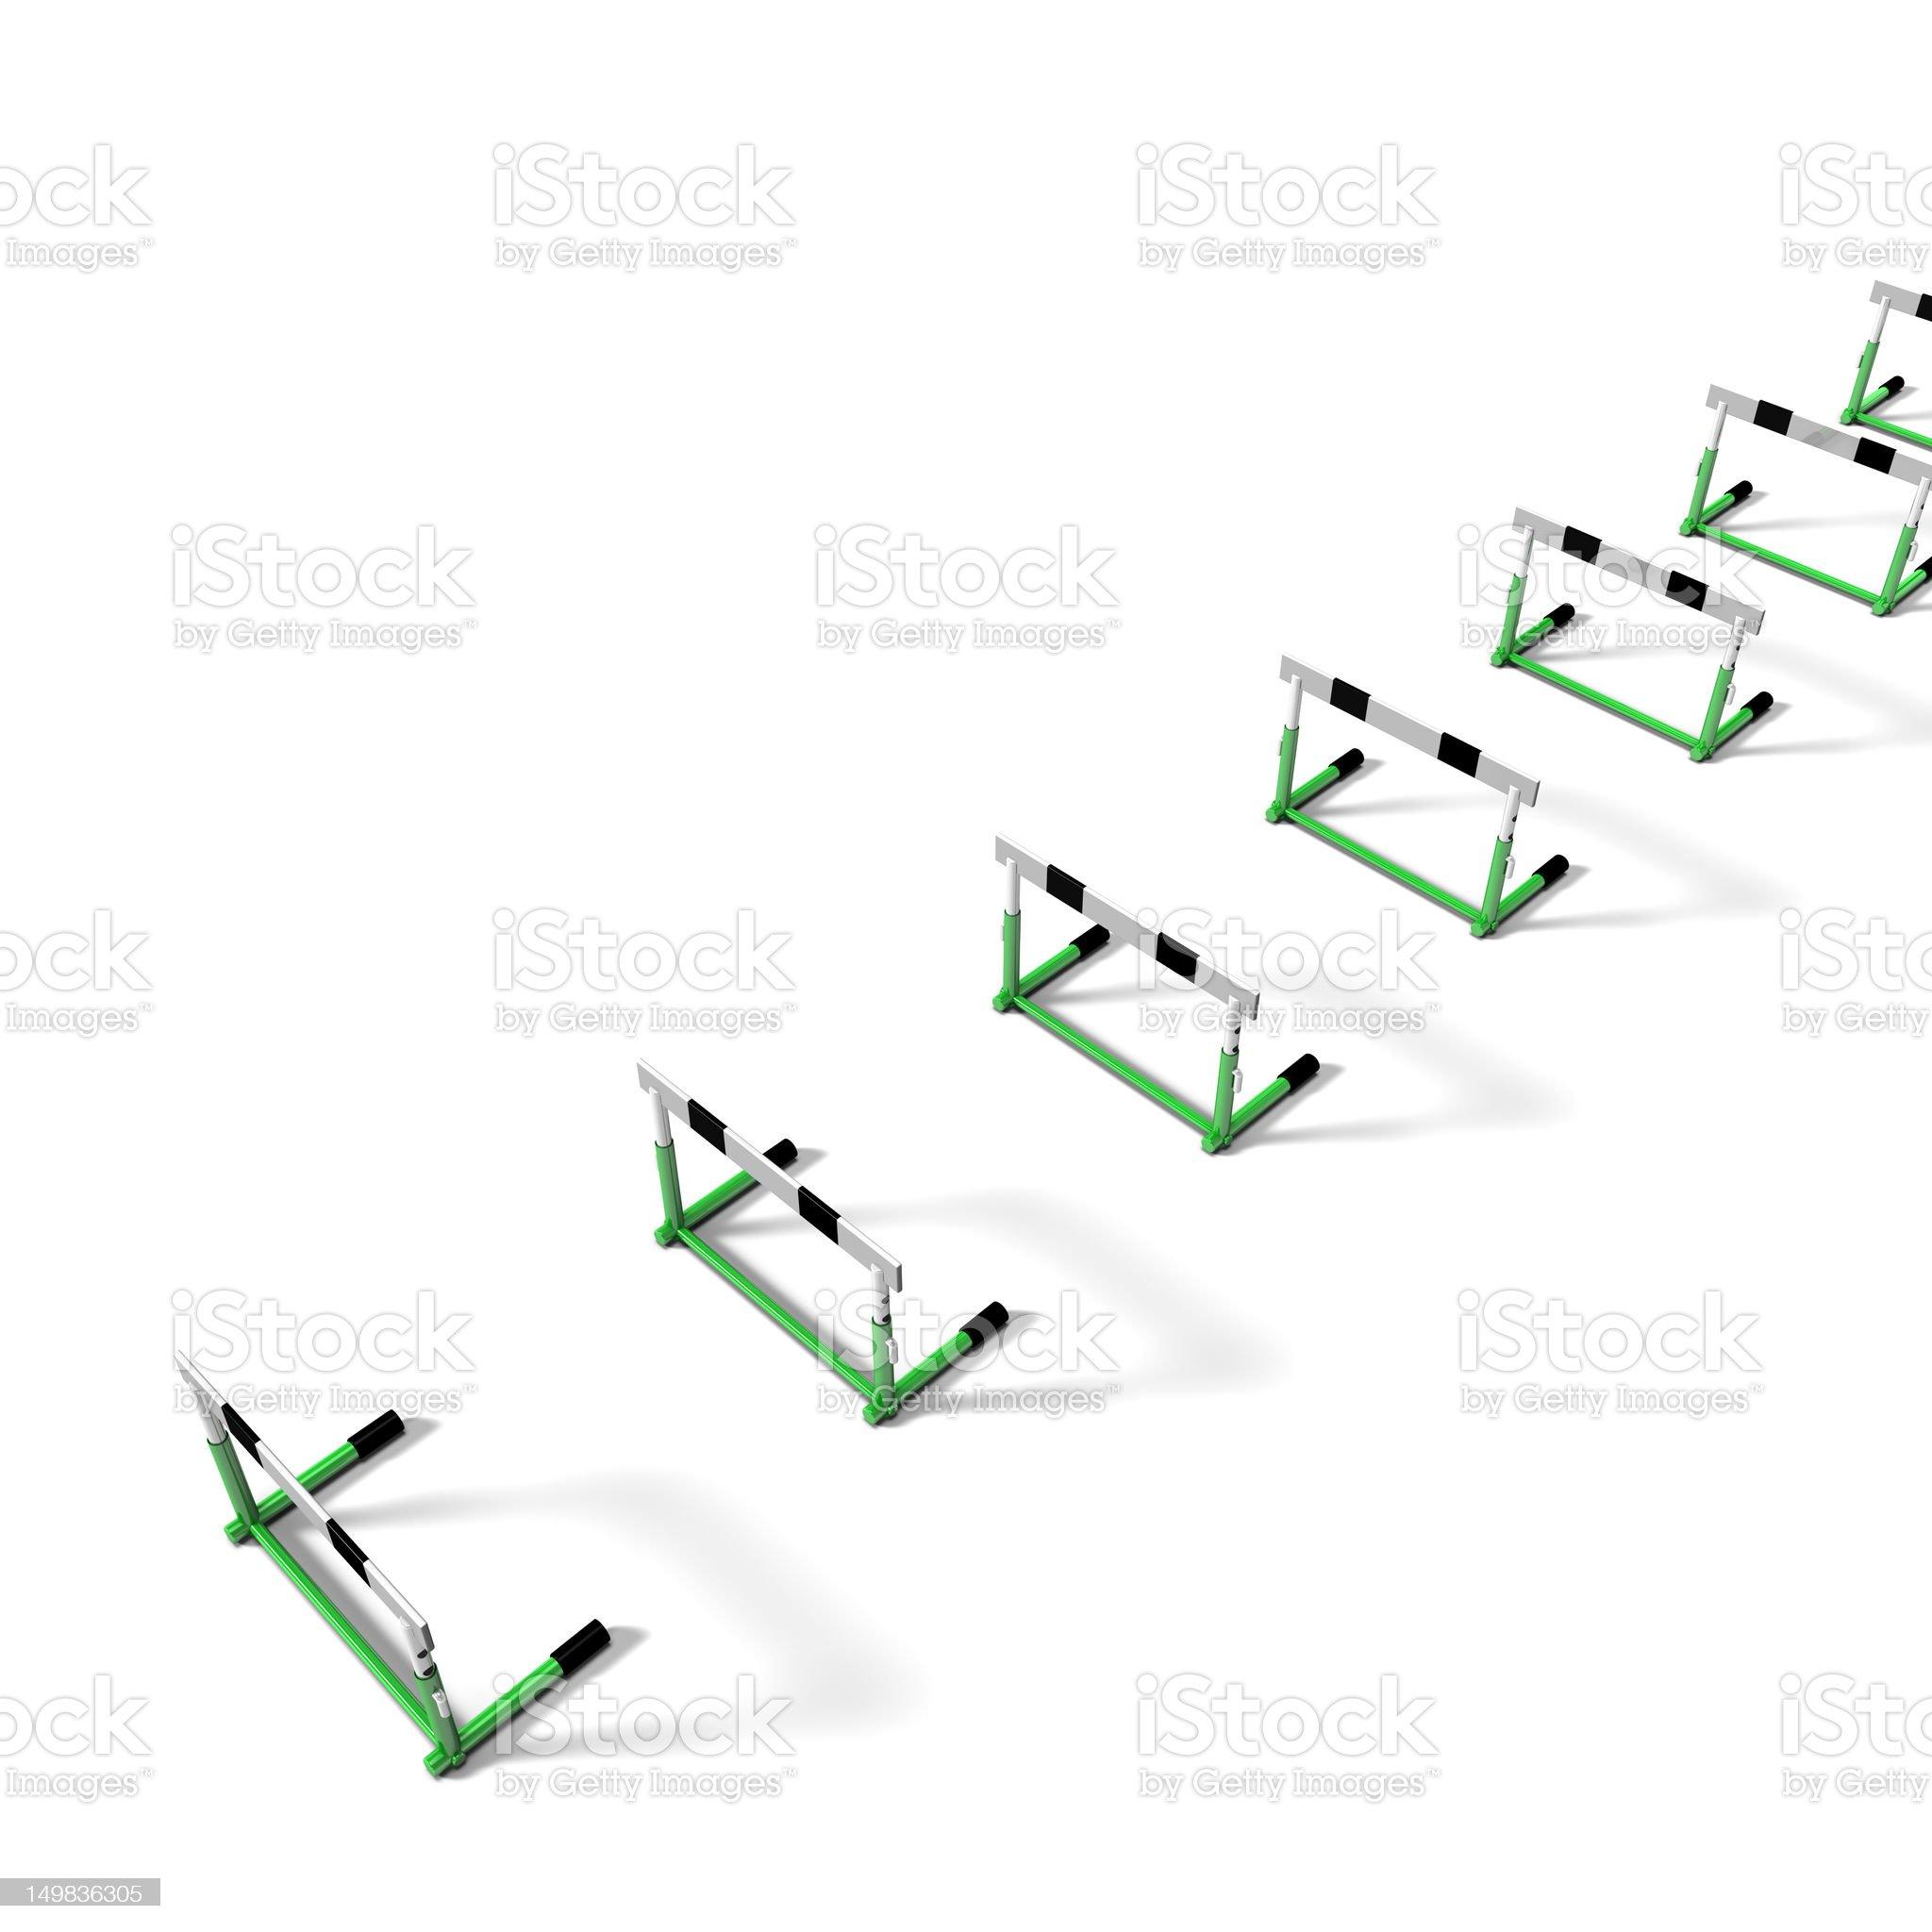 Hurdles On White Back Ground royalty-free stock vector art